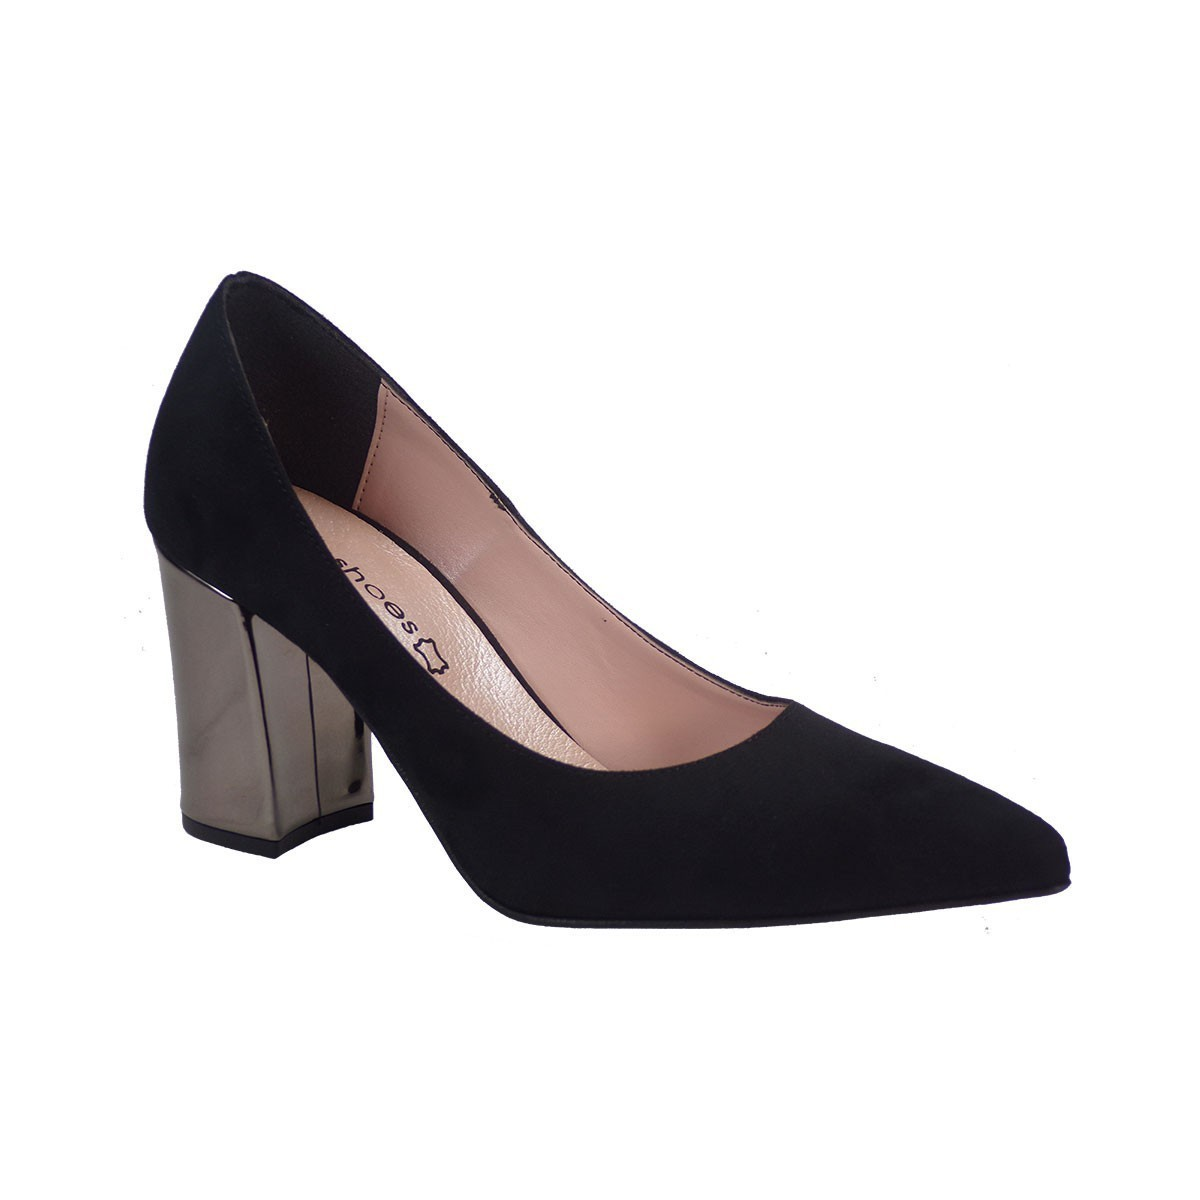 KATIA SHOES Γυναικεία Παπούτσια Γόβες Γόβα/1789 Mαύρο